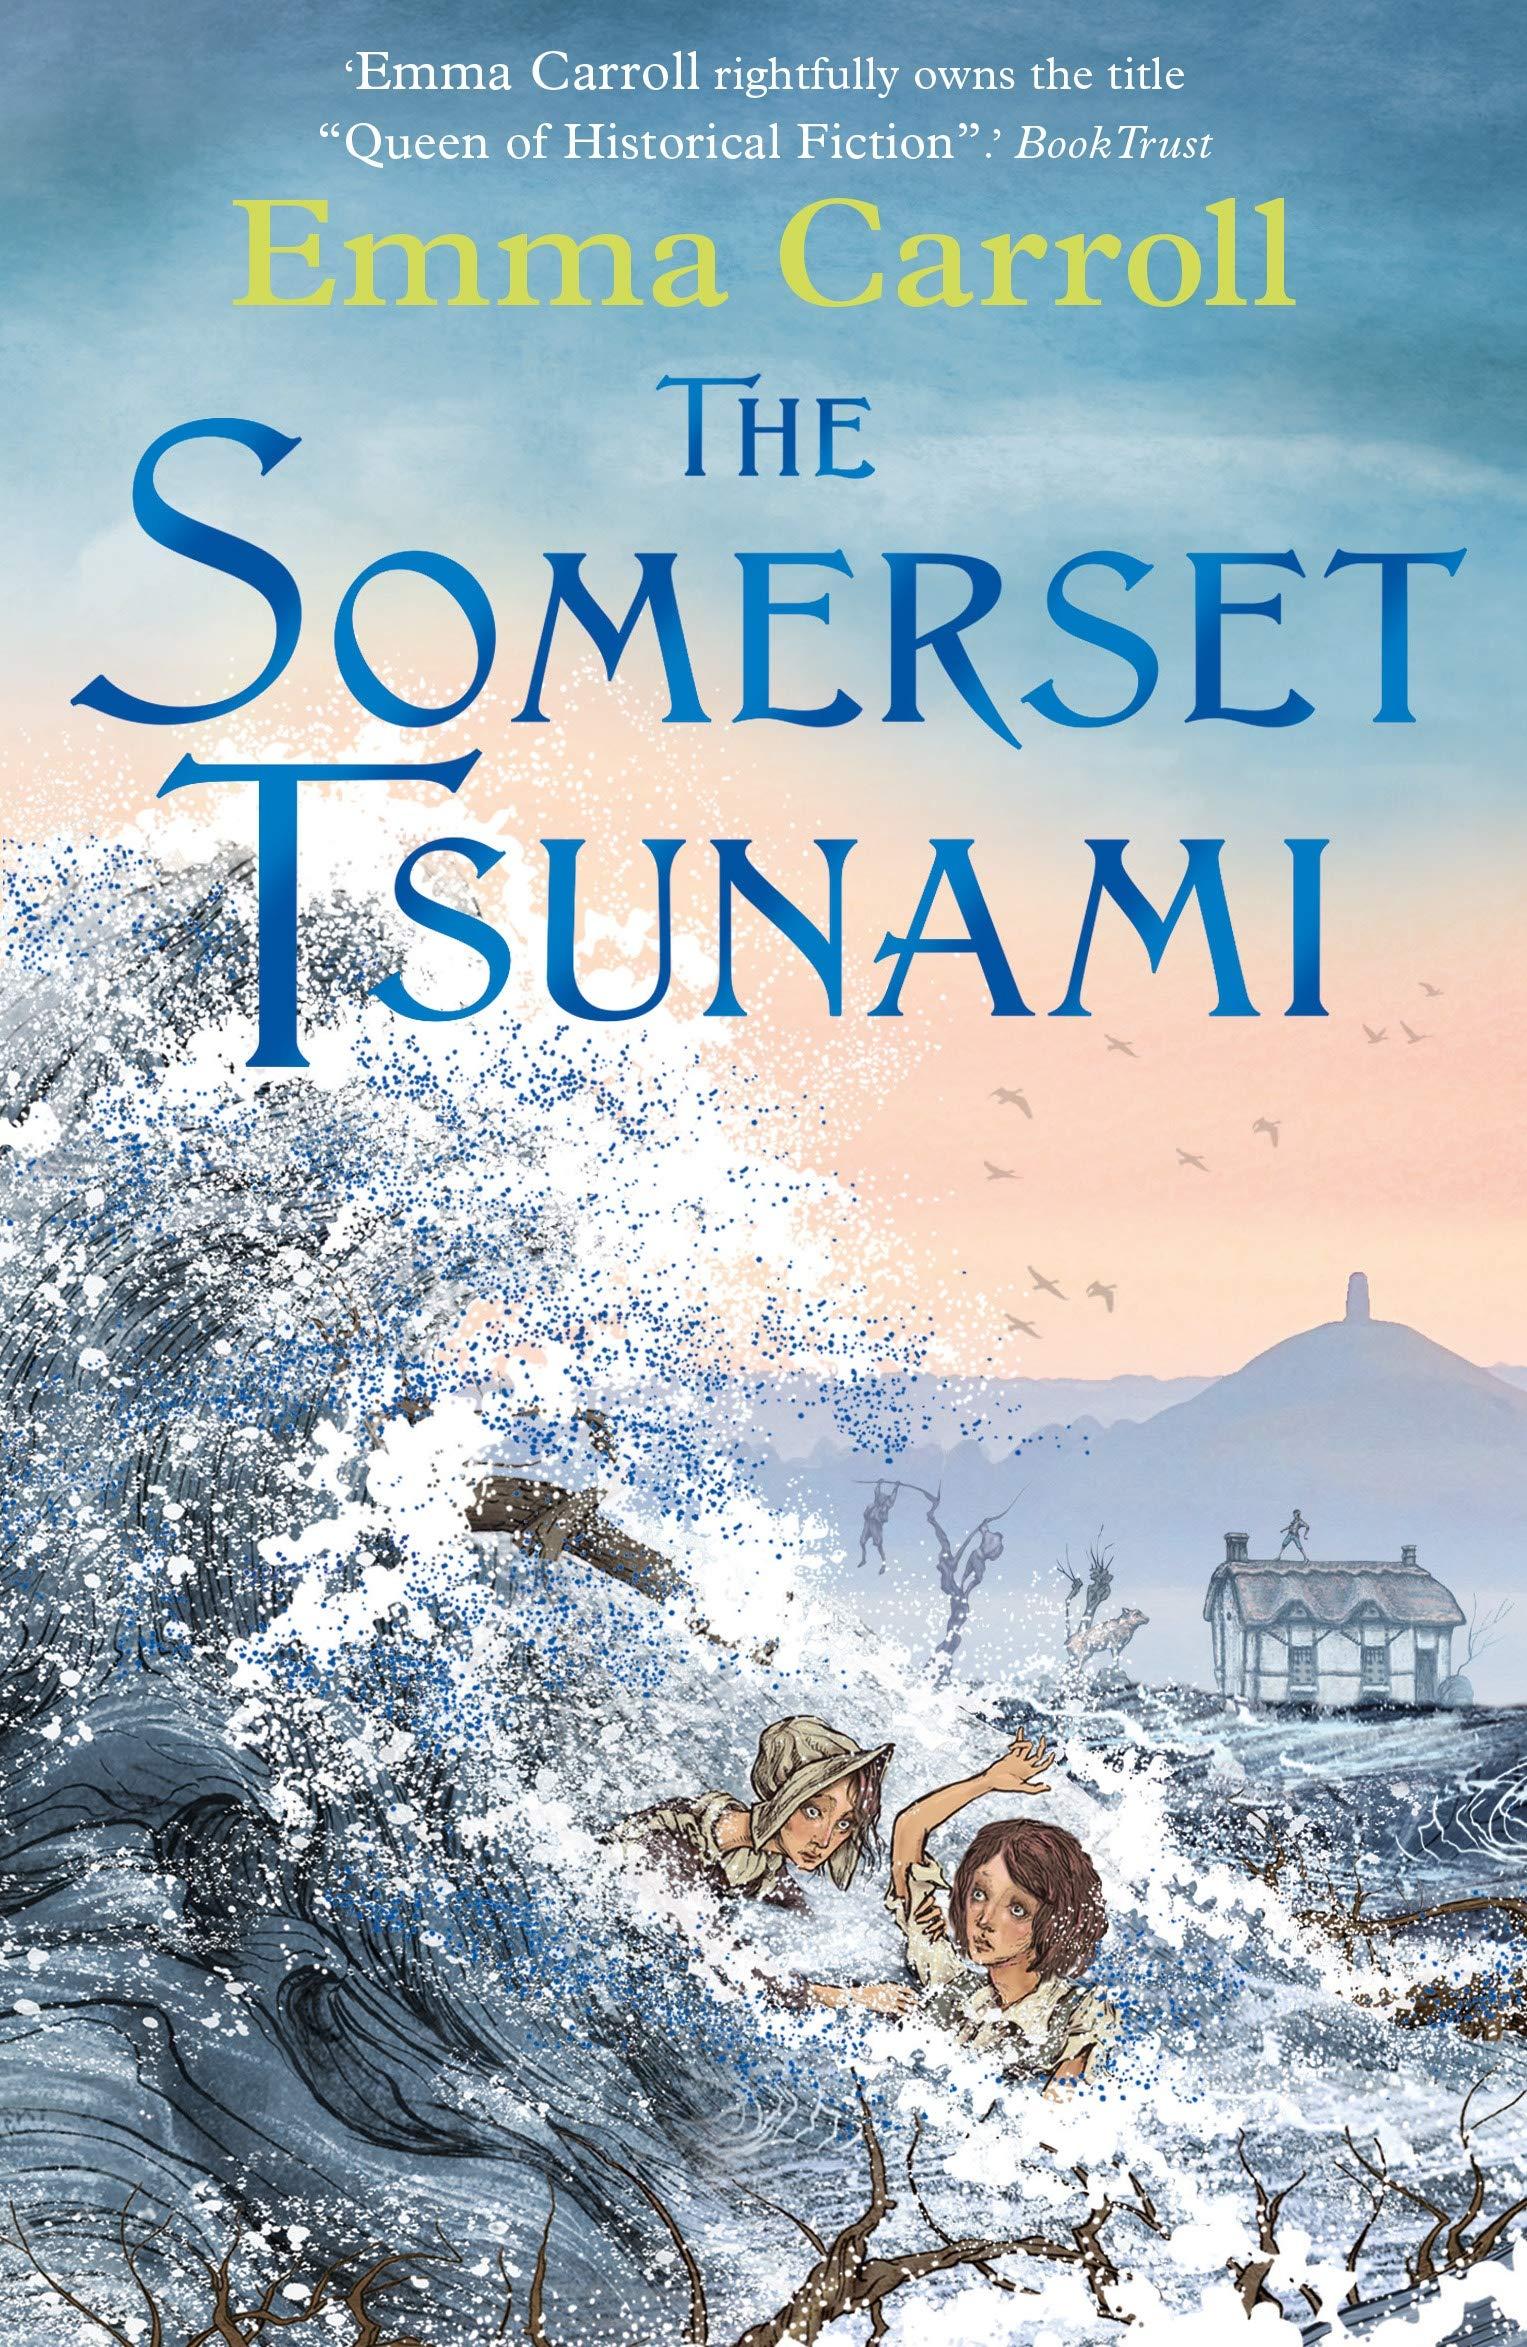 The Somerset Tsunami: Amazon.co.uk: Carroll, Emma: 9780571332816: Books